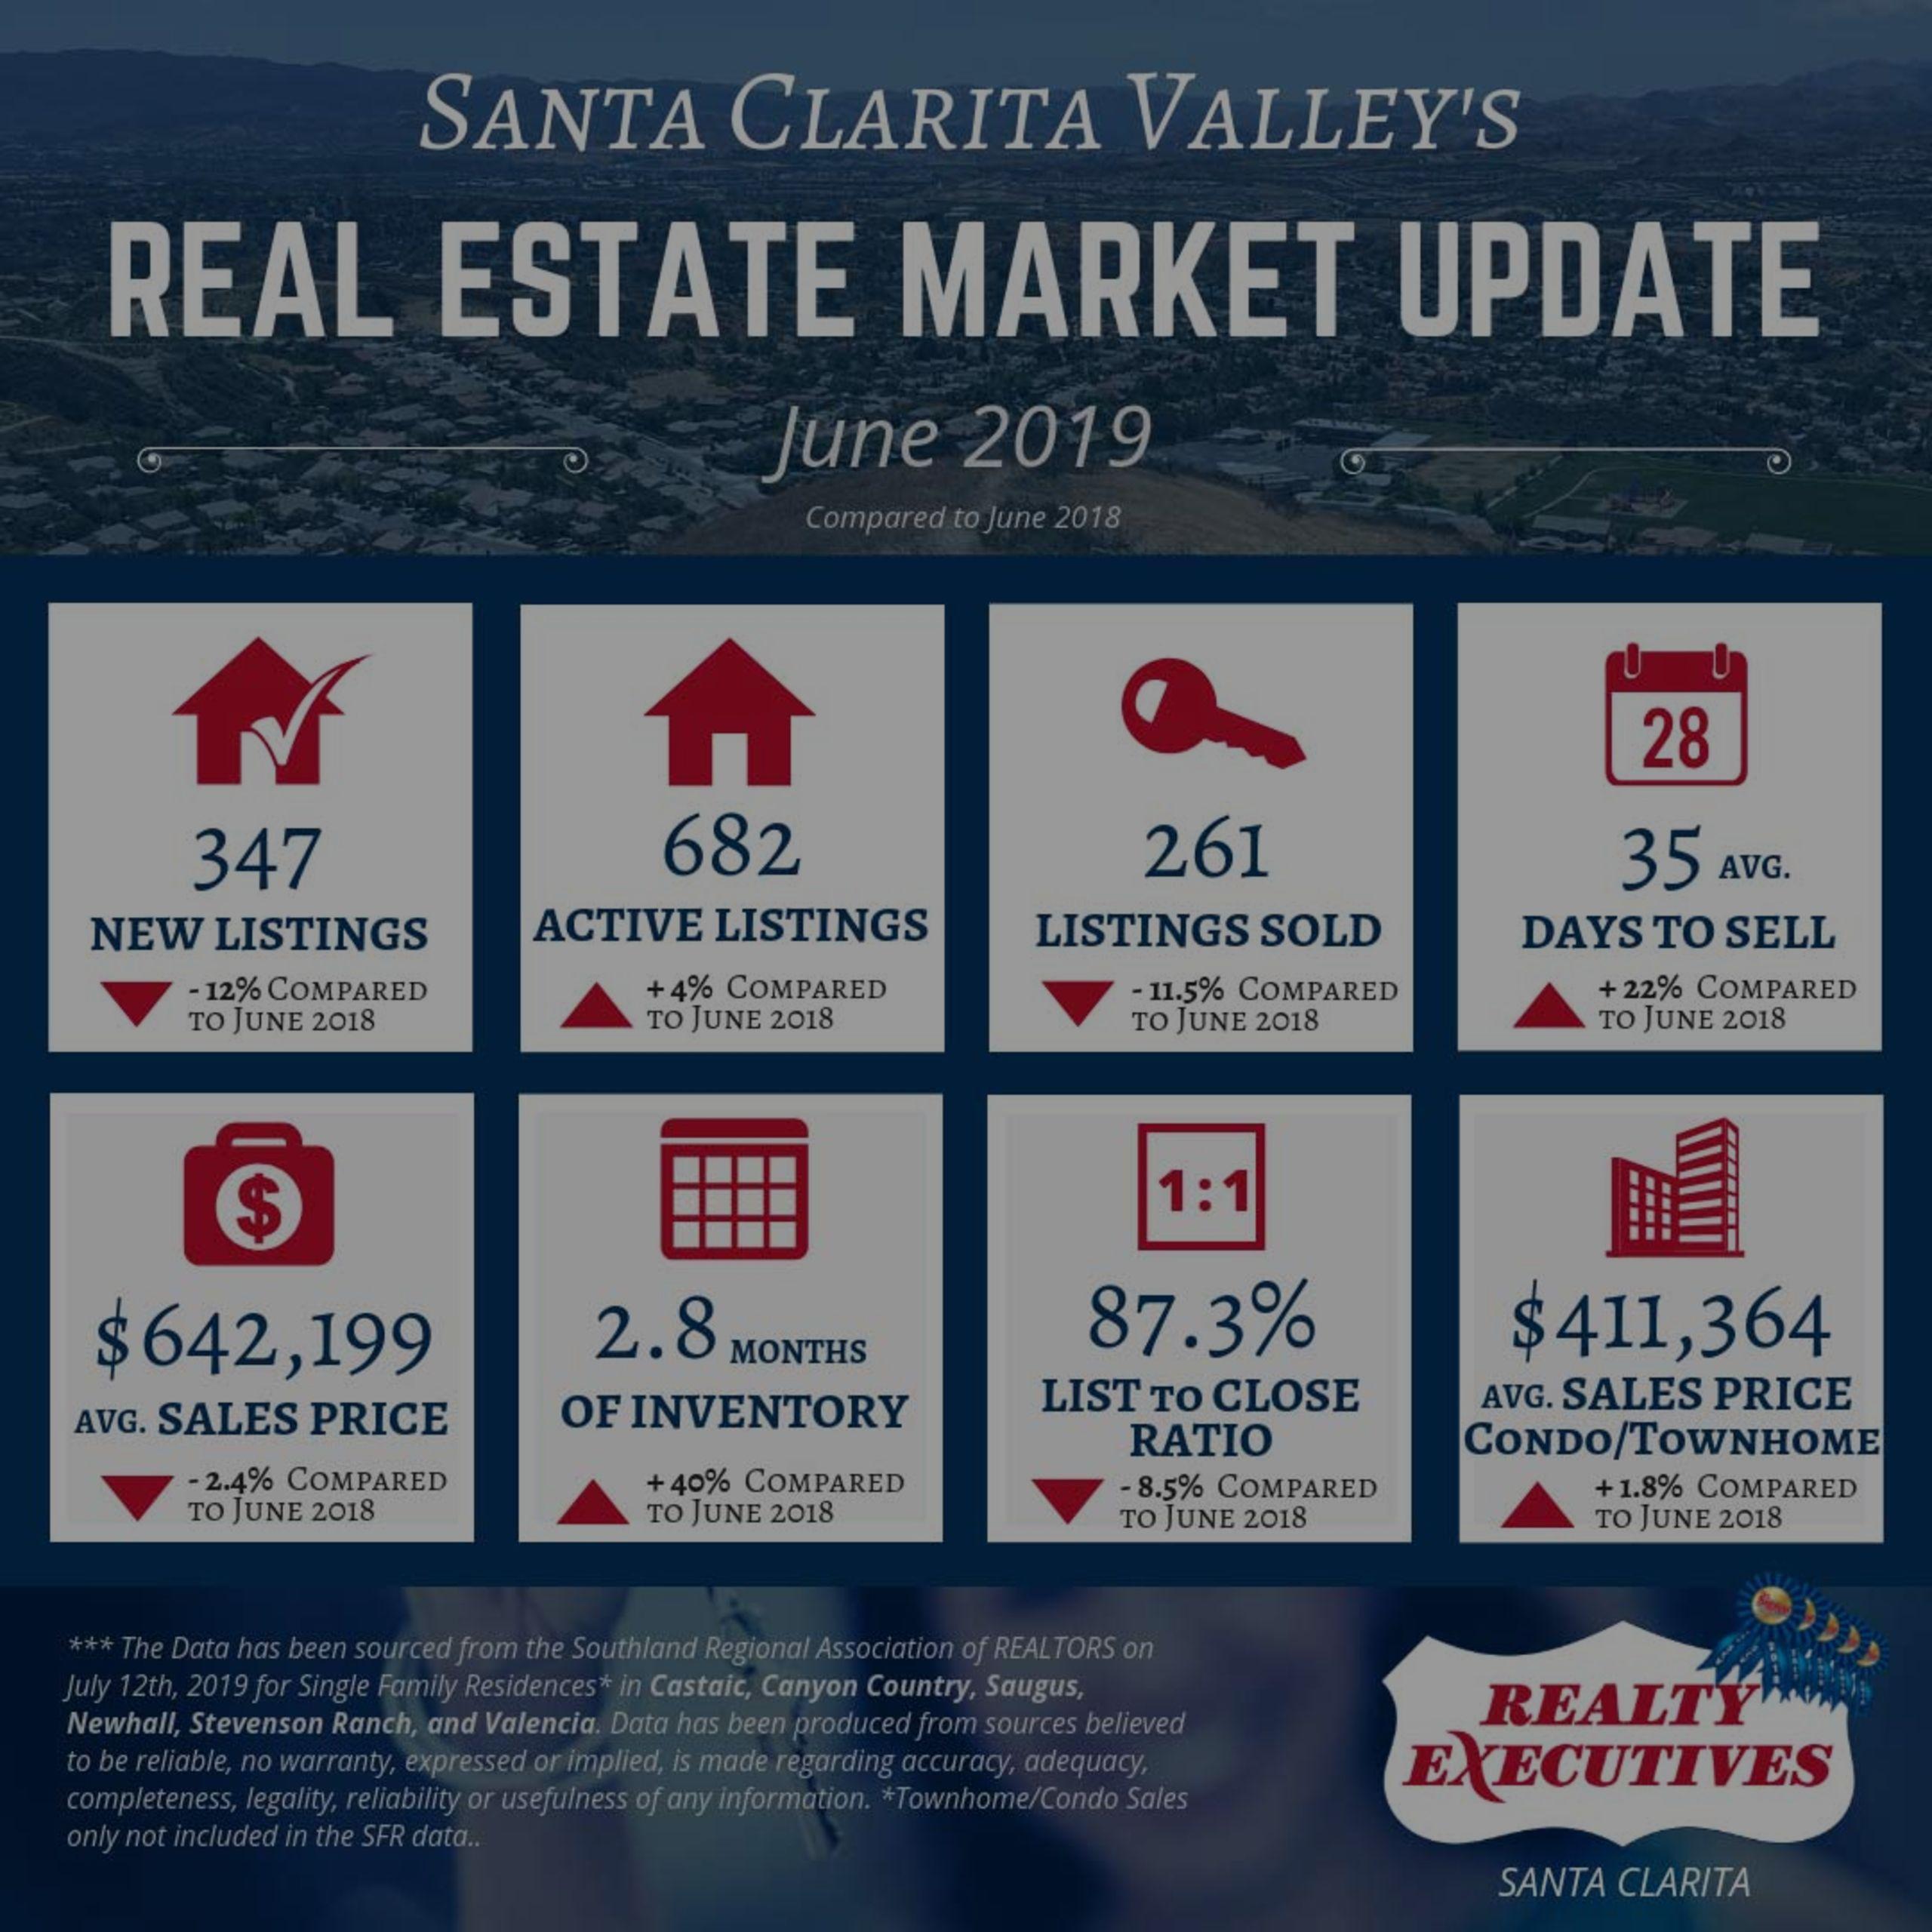 June 2019: Santa Clarita Valley Real Estate Market Update